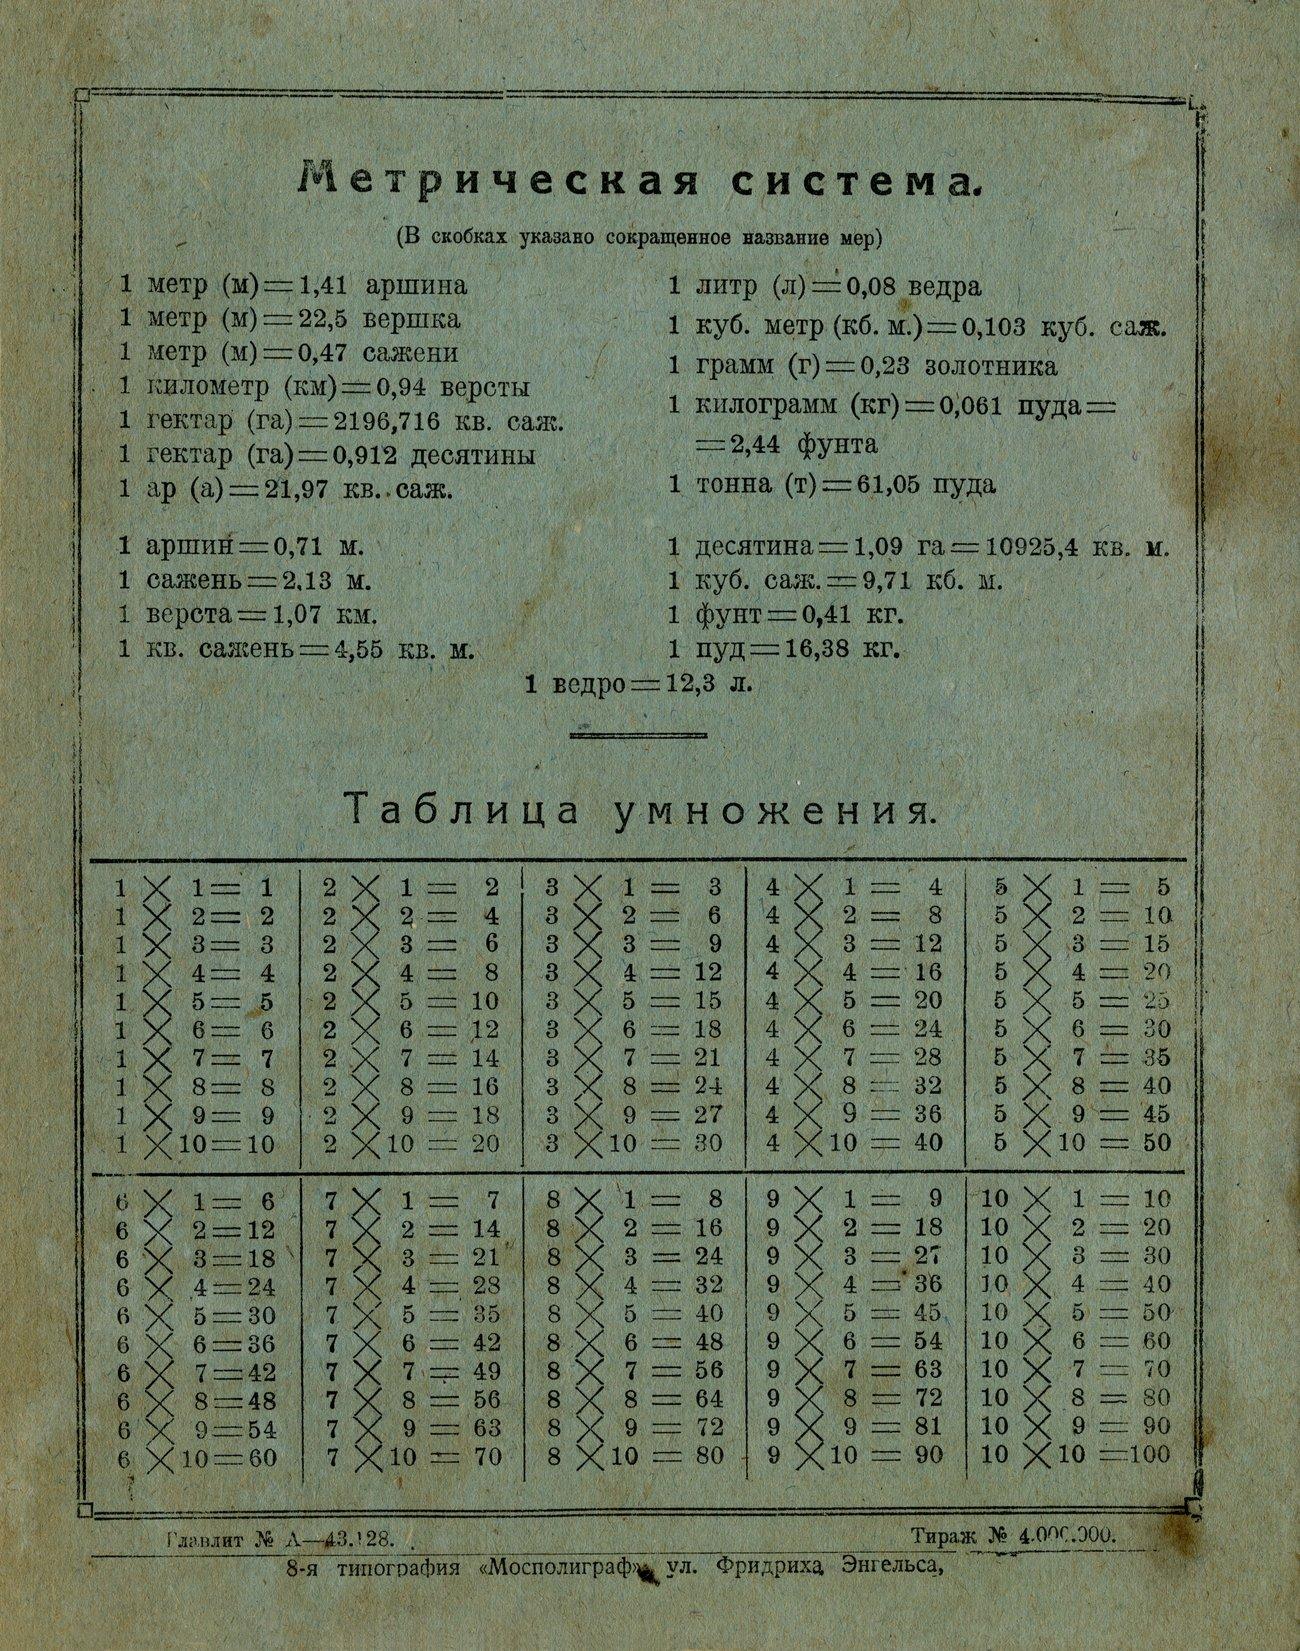 Тетрадь СССР 34 оборот